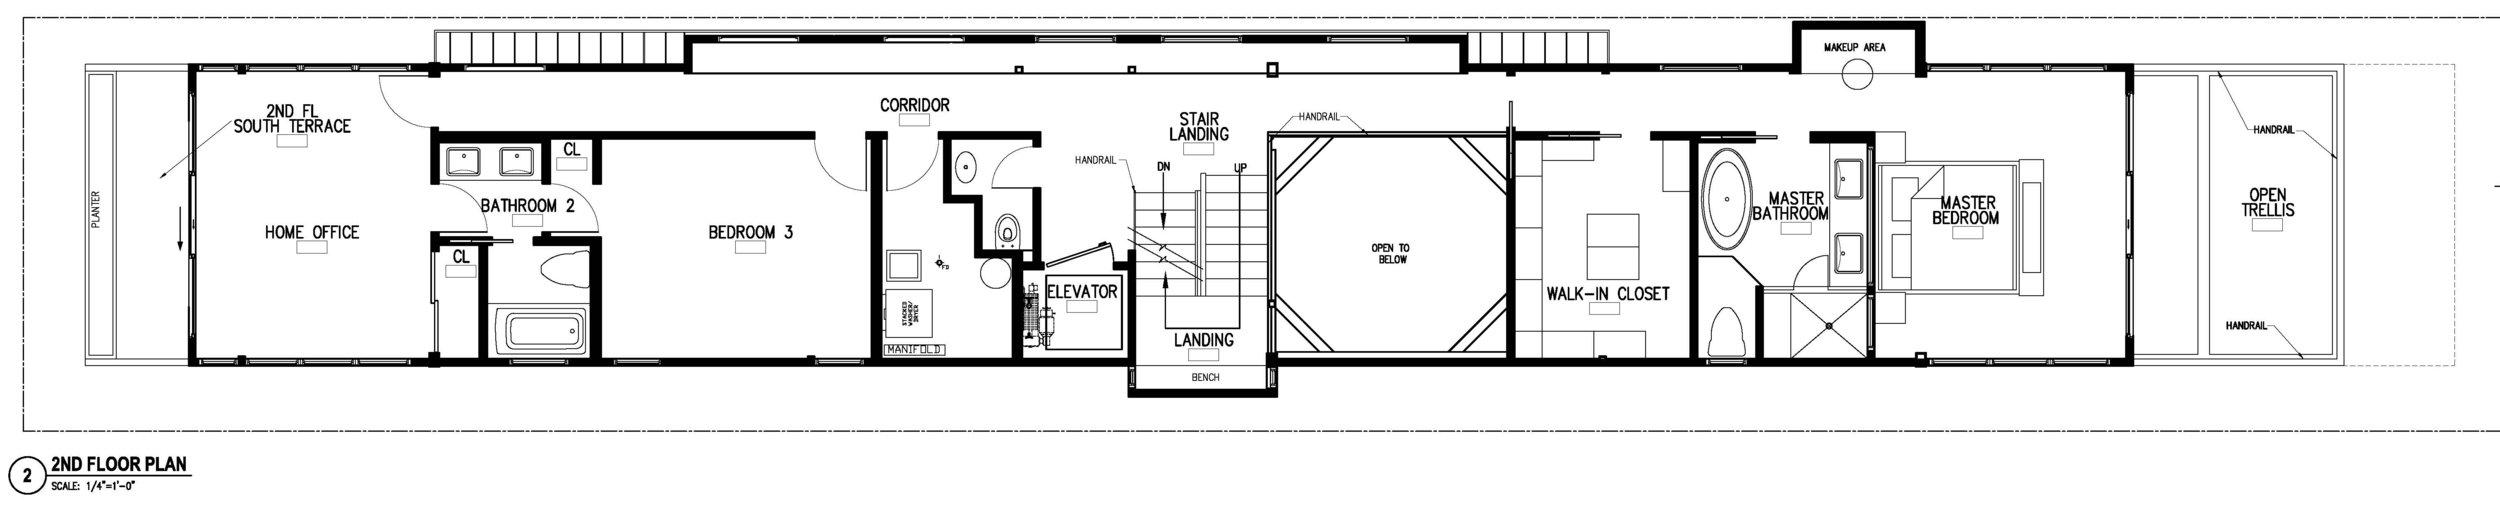 crs 2nd floor for web.jpg